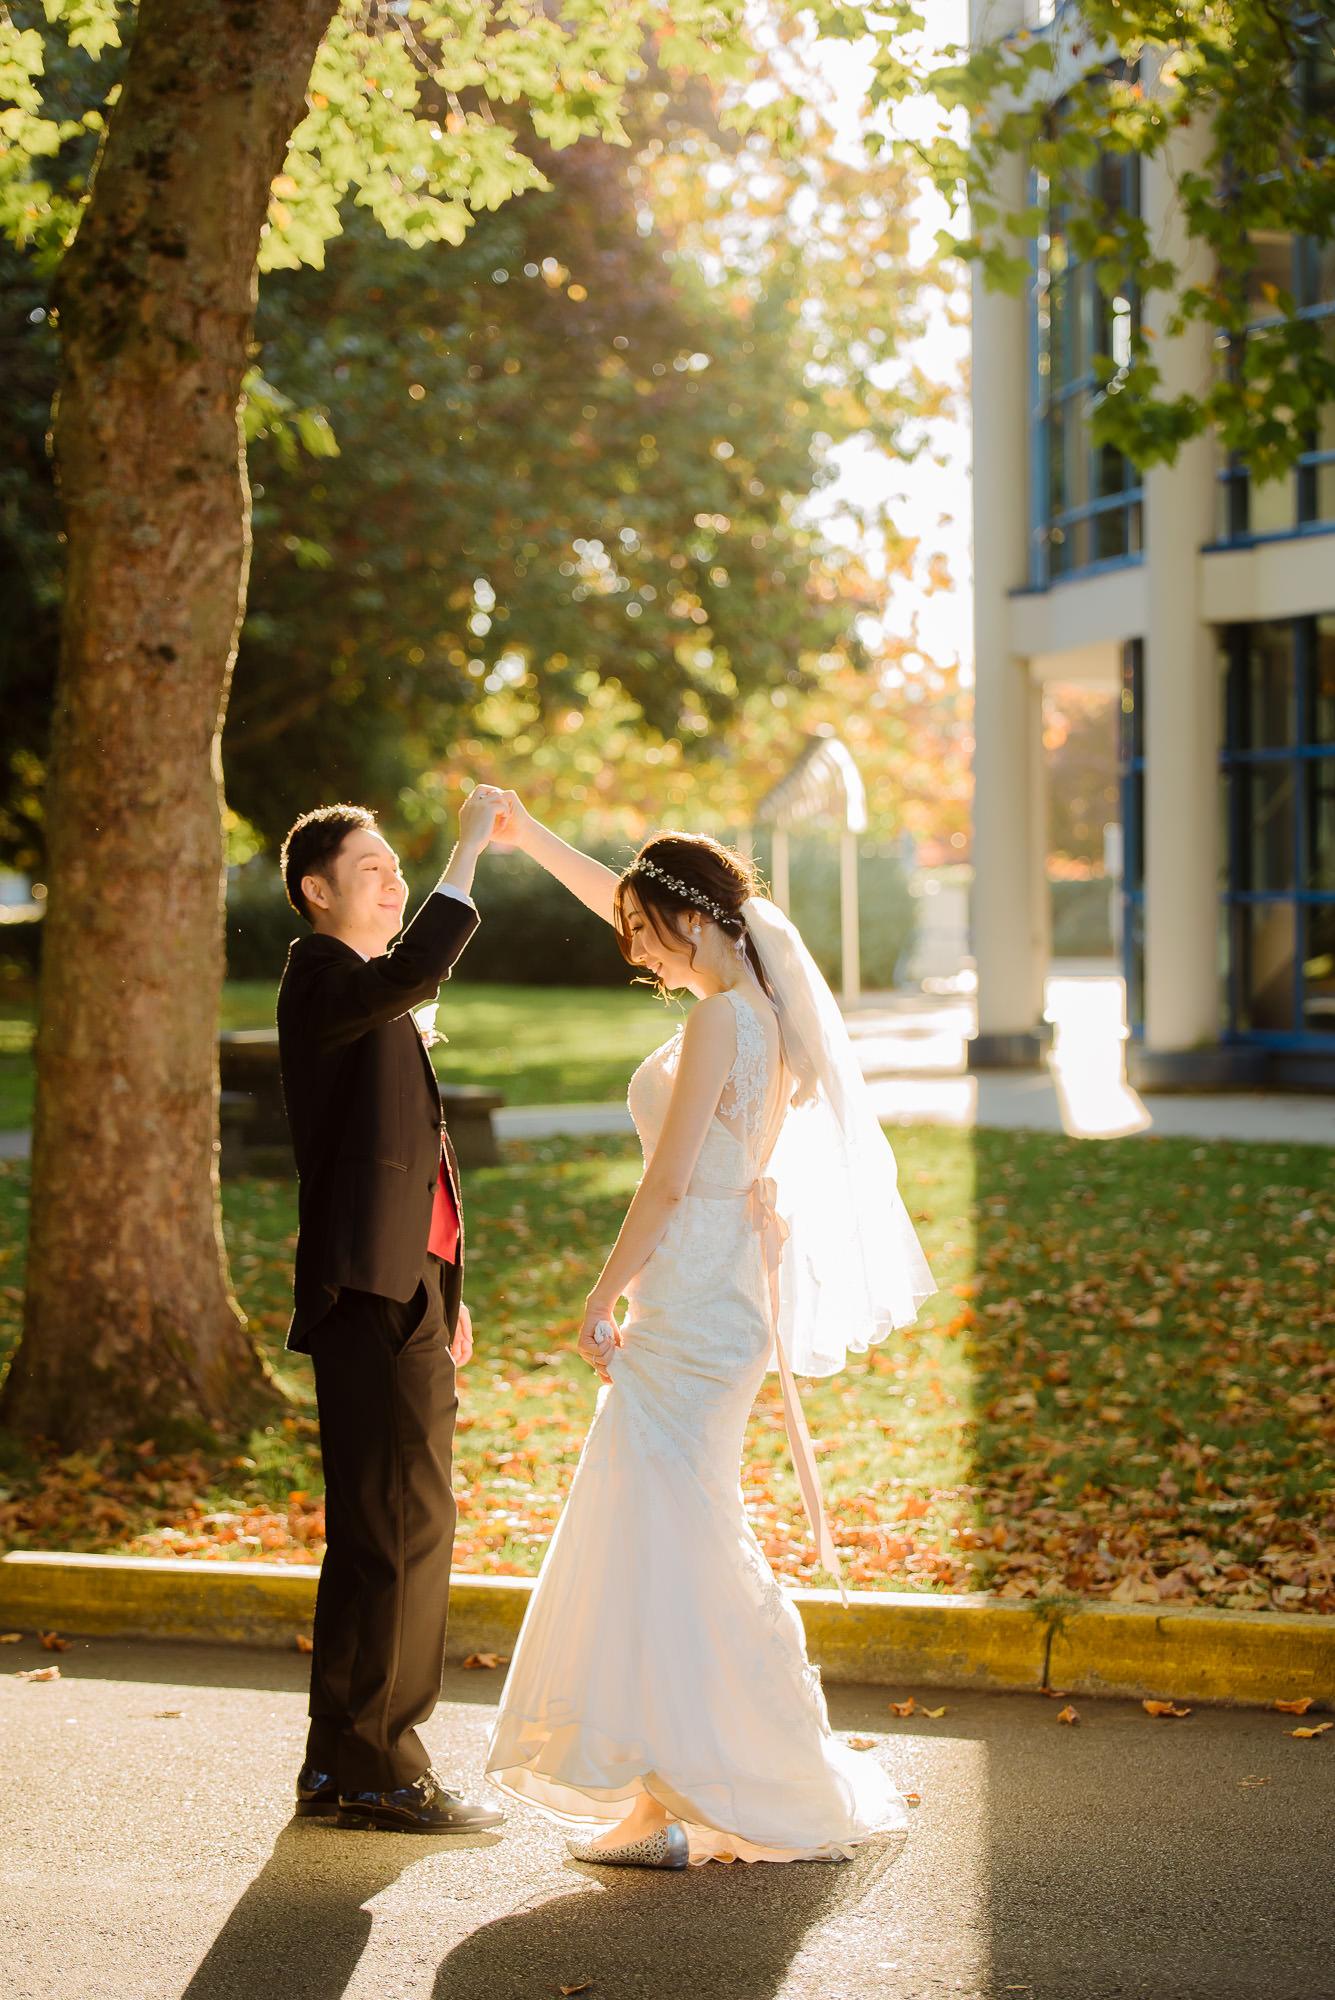 minoru_chapel_richmond_wedding_ceremony 17272124.jpg